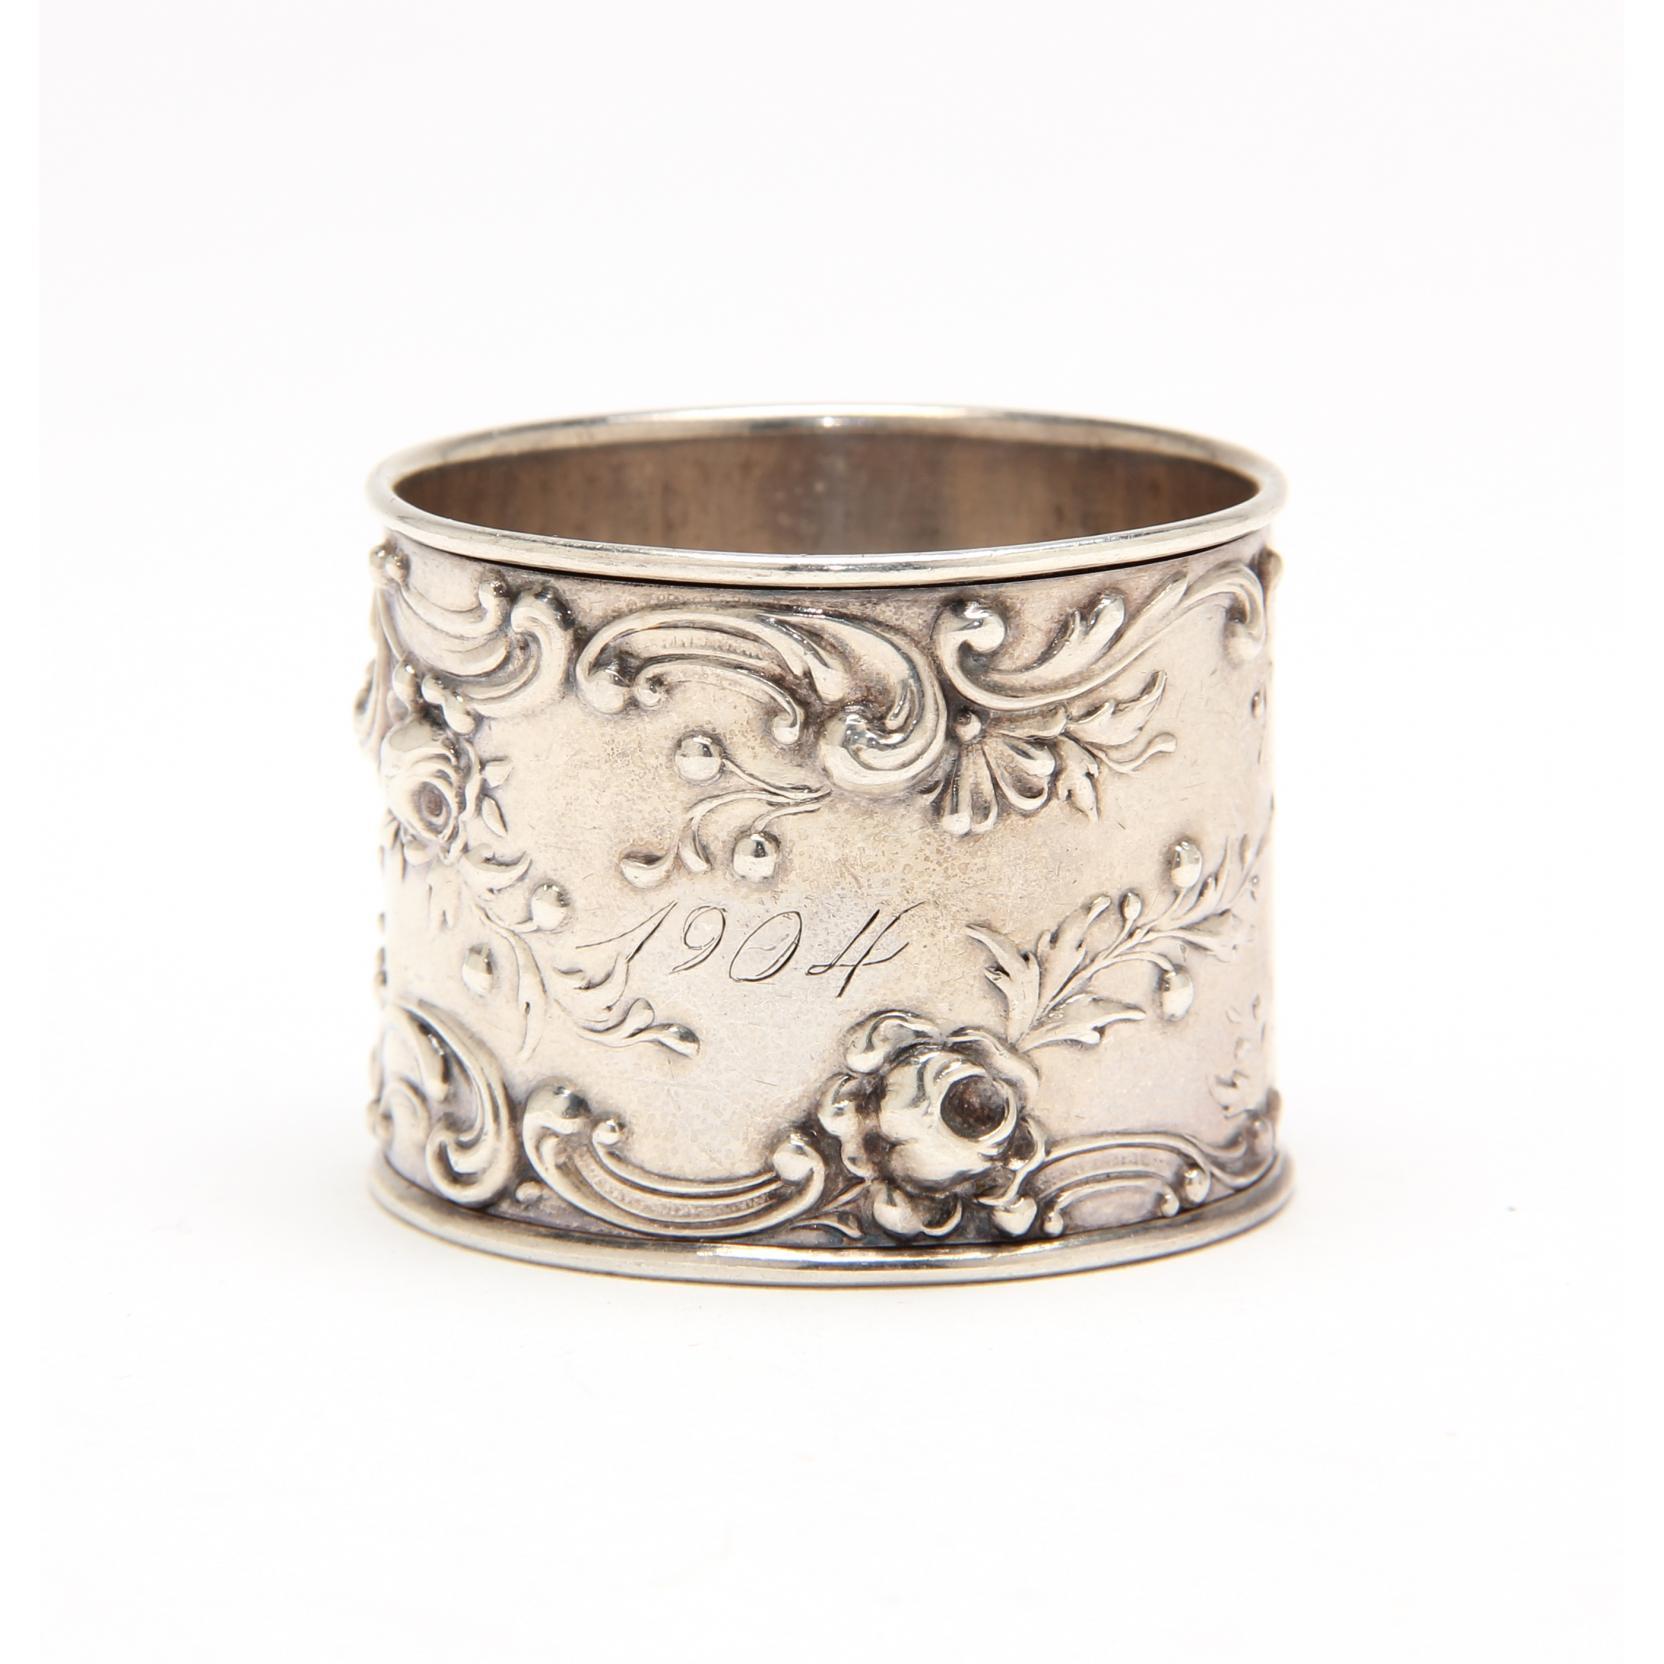 sterling-silver-napkin-ring-att-gorham